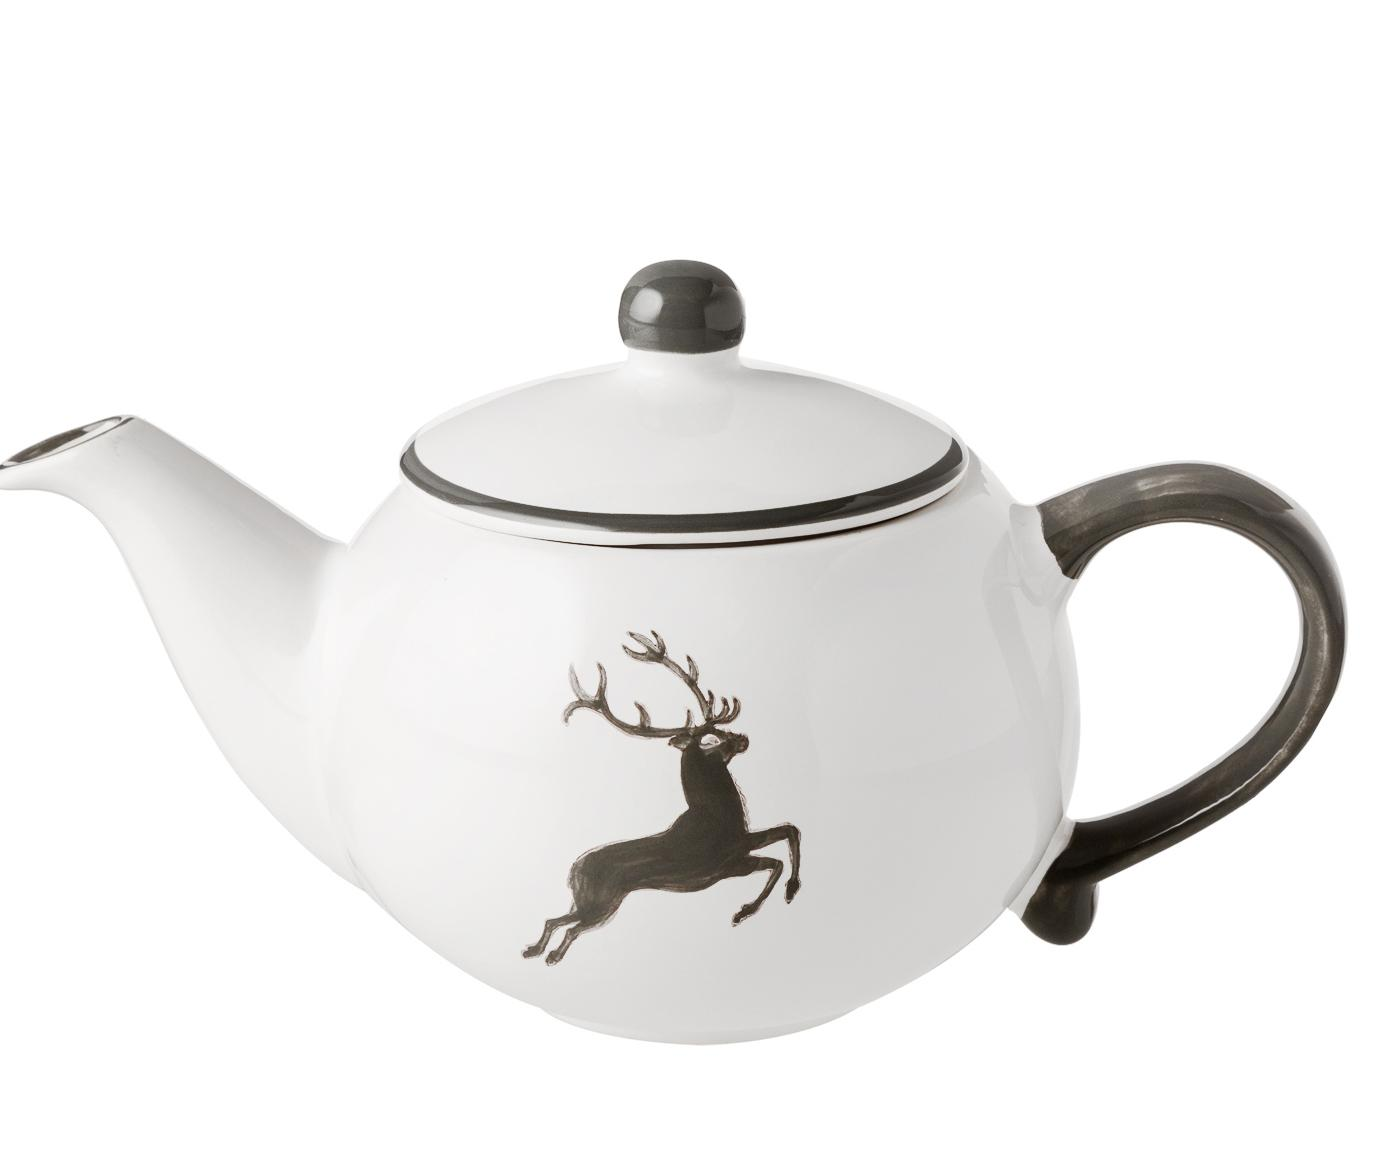 Teiera Classic Grauer Hirsch, Ceramica, Grigio, bianco, 500 ml